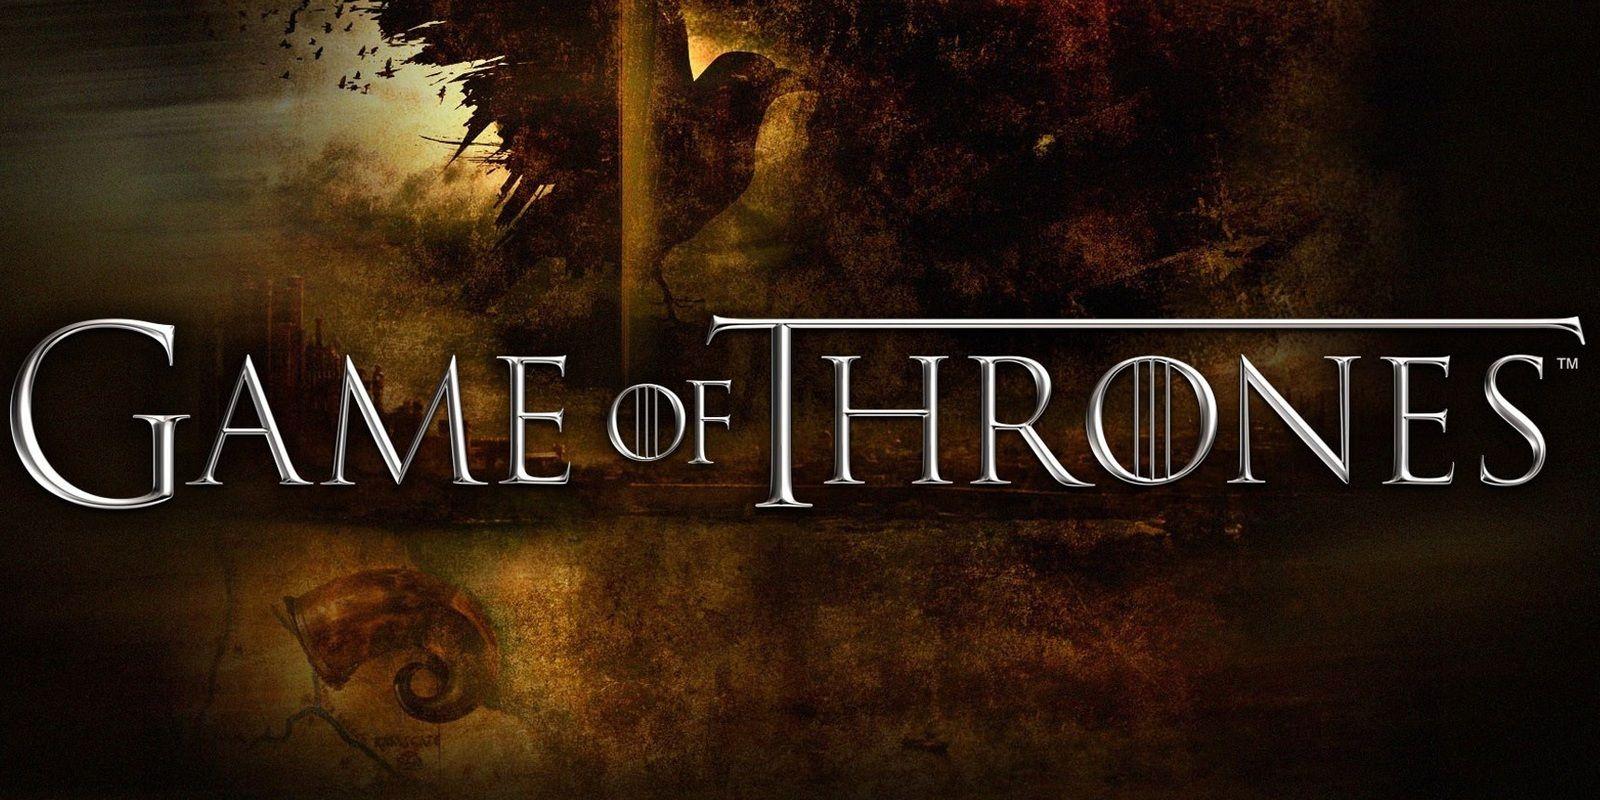 Serial Igra Prestolov 2017 G Http God2017 Com Filmy Serial Igra Prestolov 2017 G Game Of Thrones Online Watch Game Of Thrones Game Of Thrones Theme